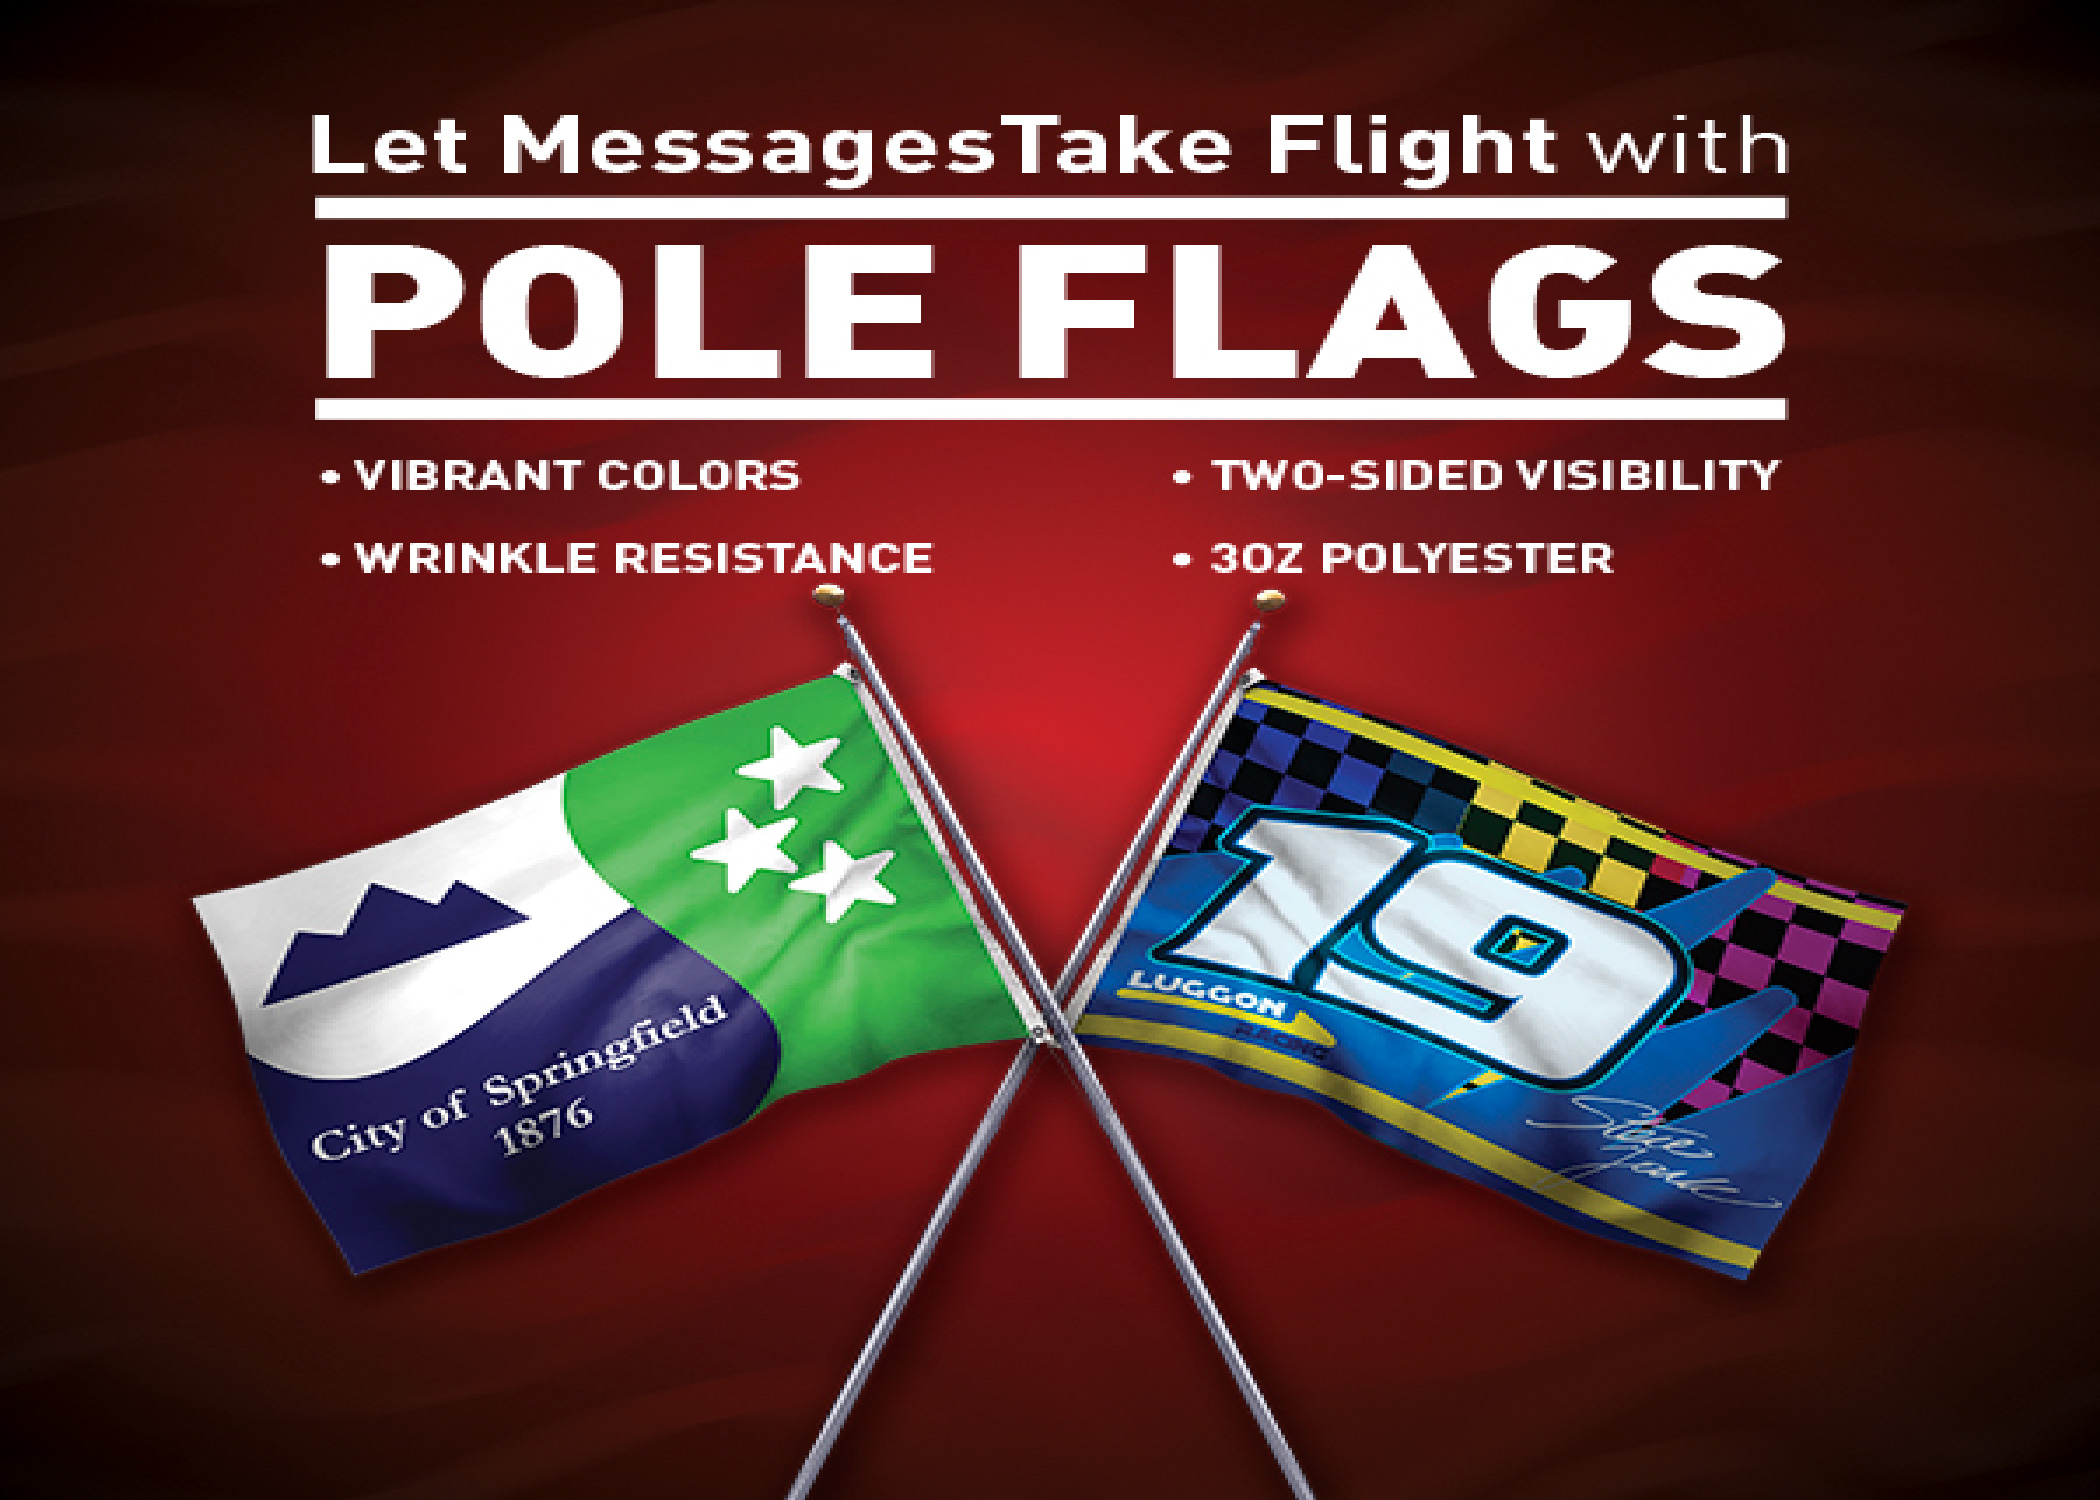 POLE FLAGS